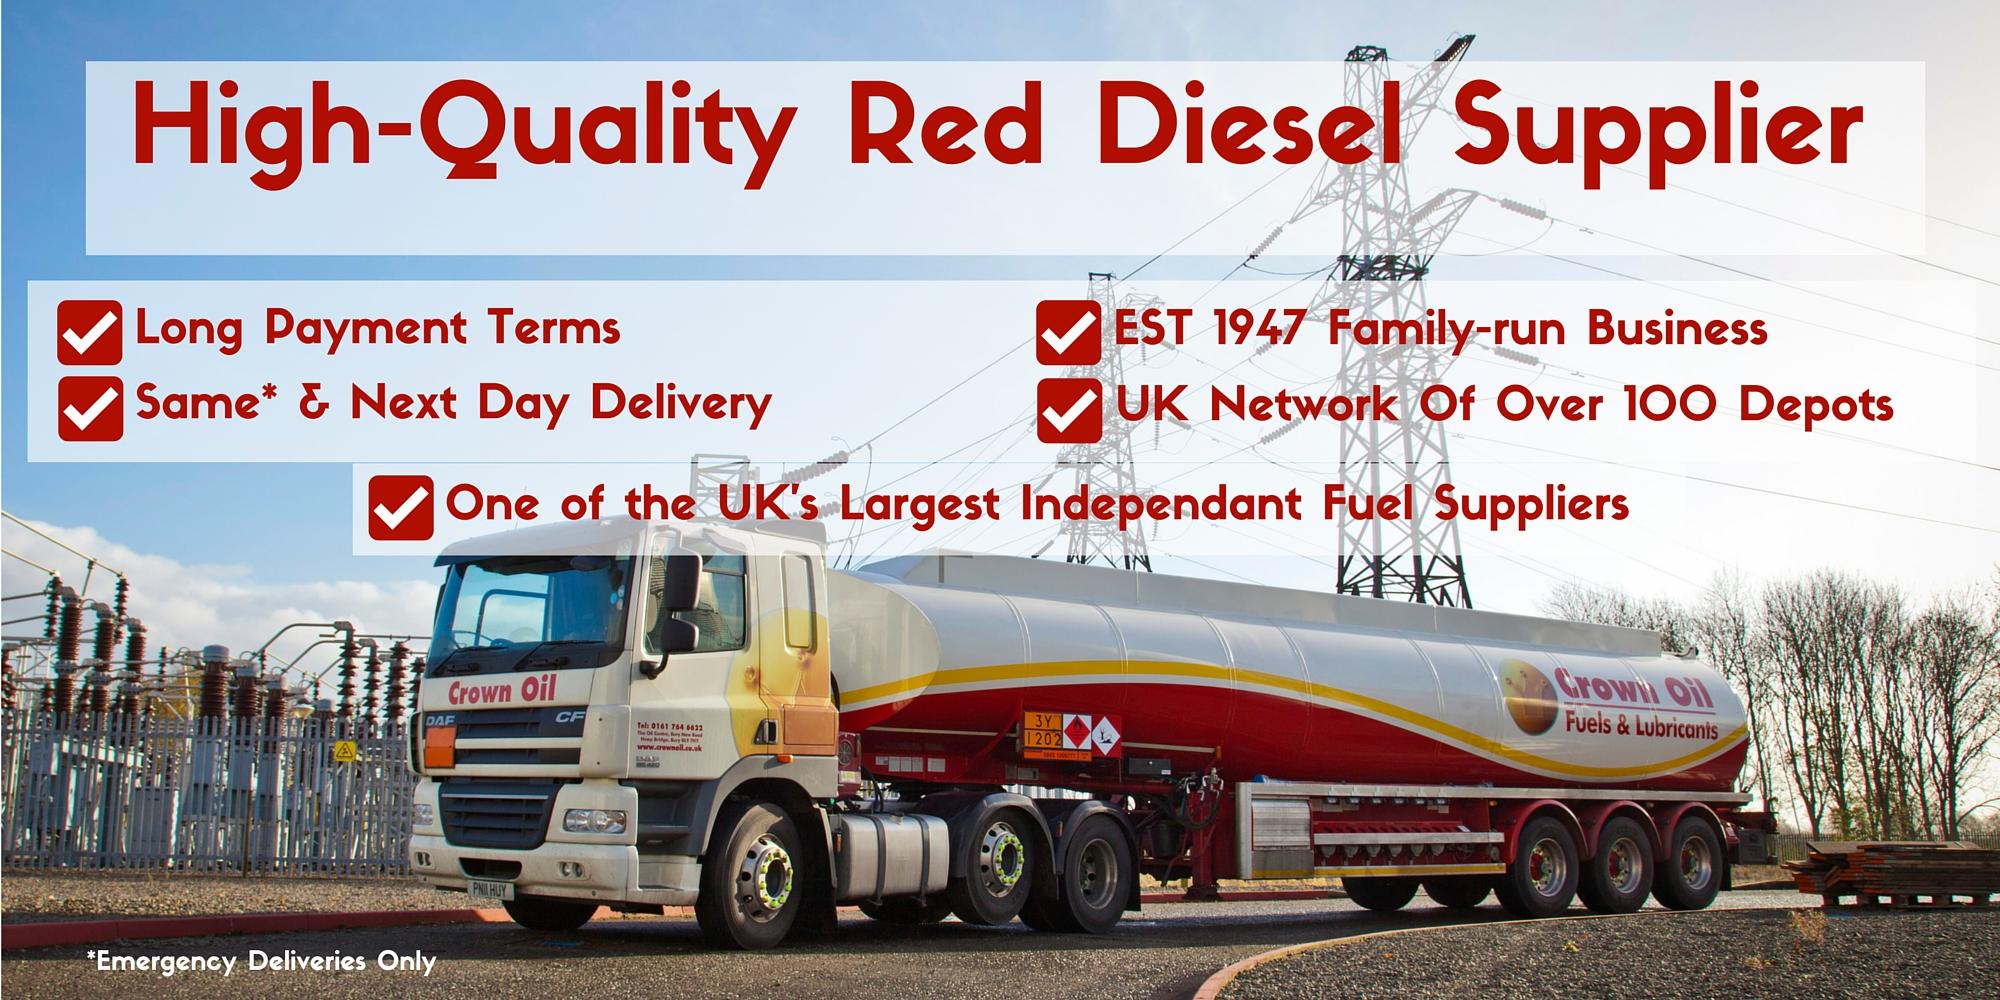 High-Quality Red Diesel Supplier